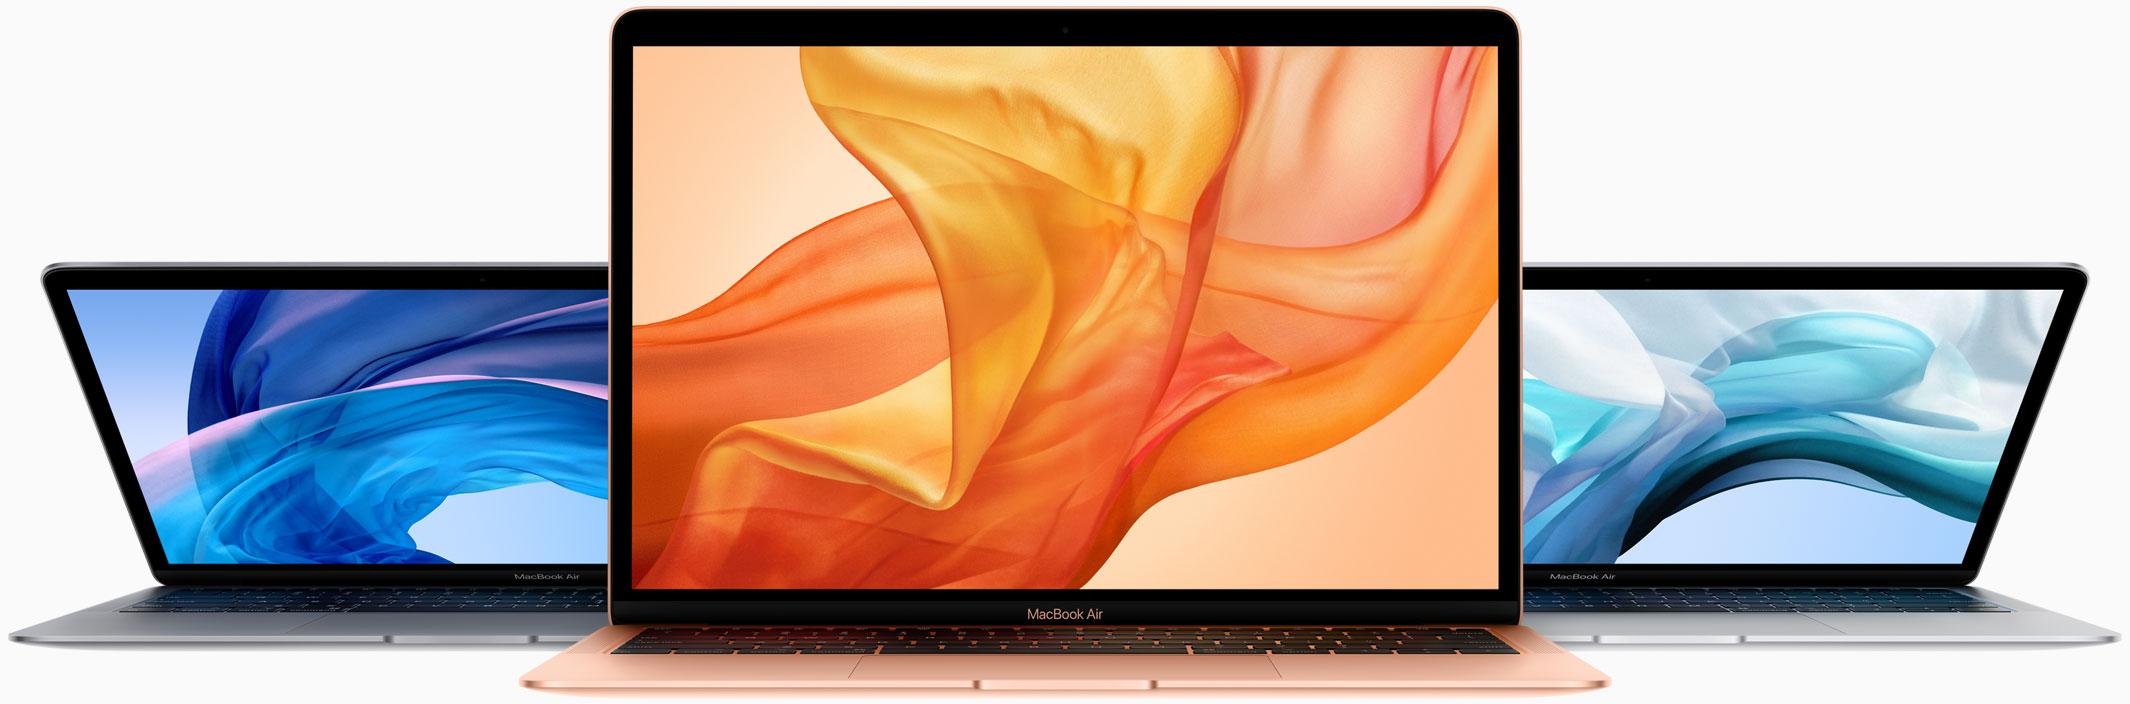 Lightness strikes again. - MacBook Air